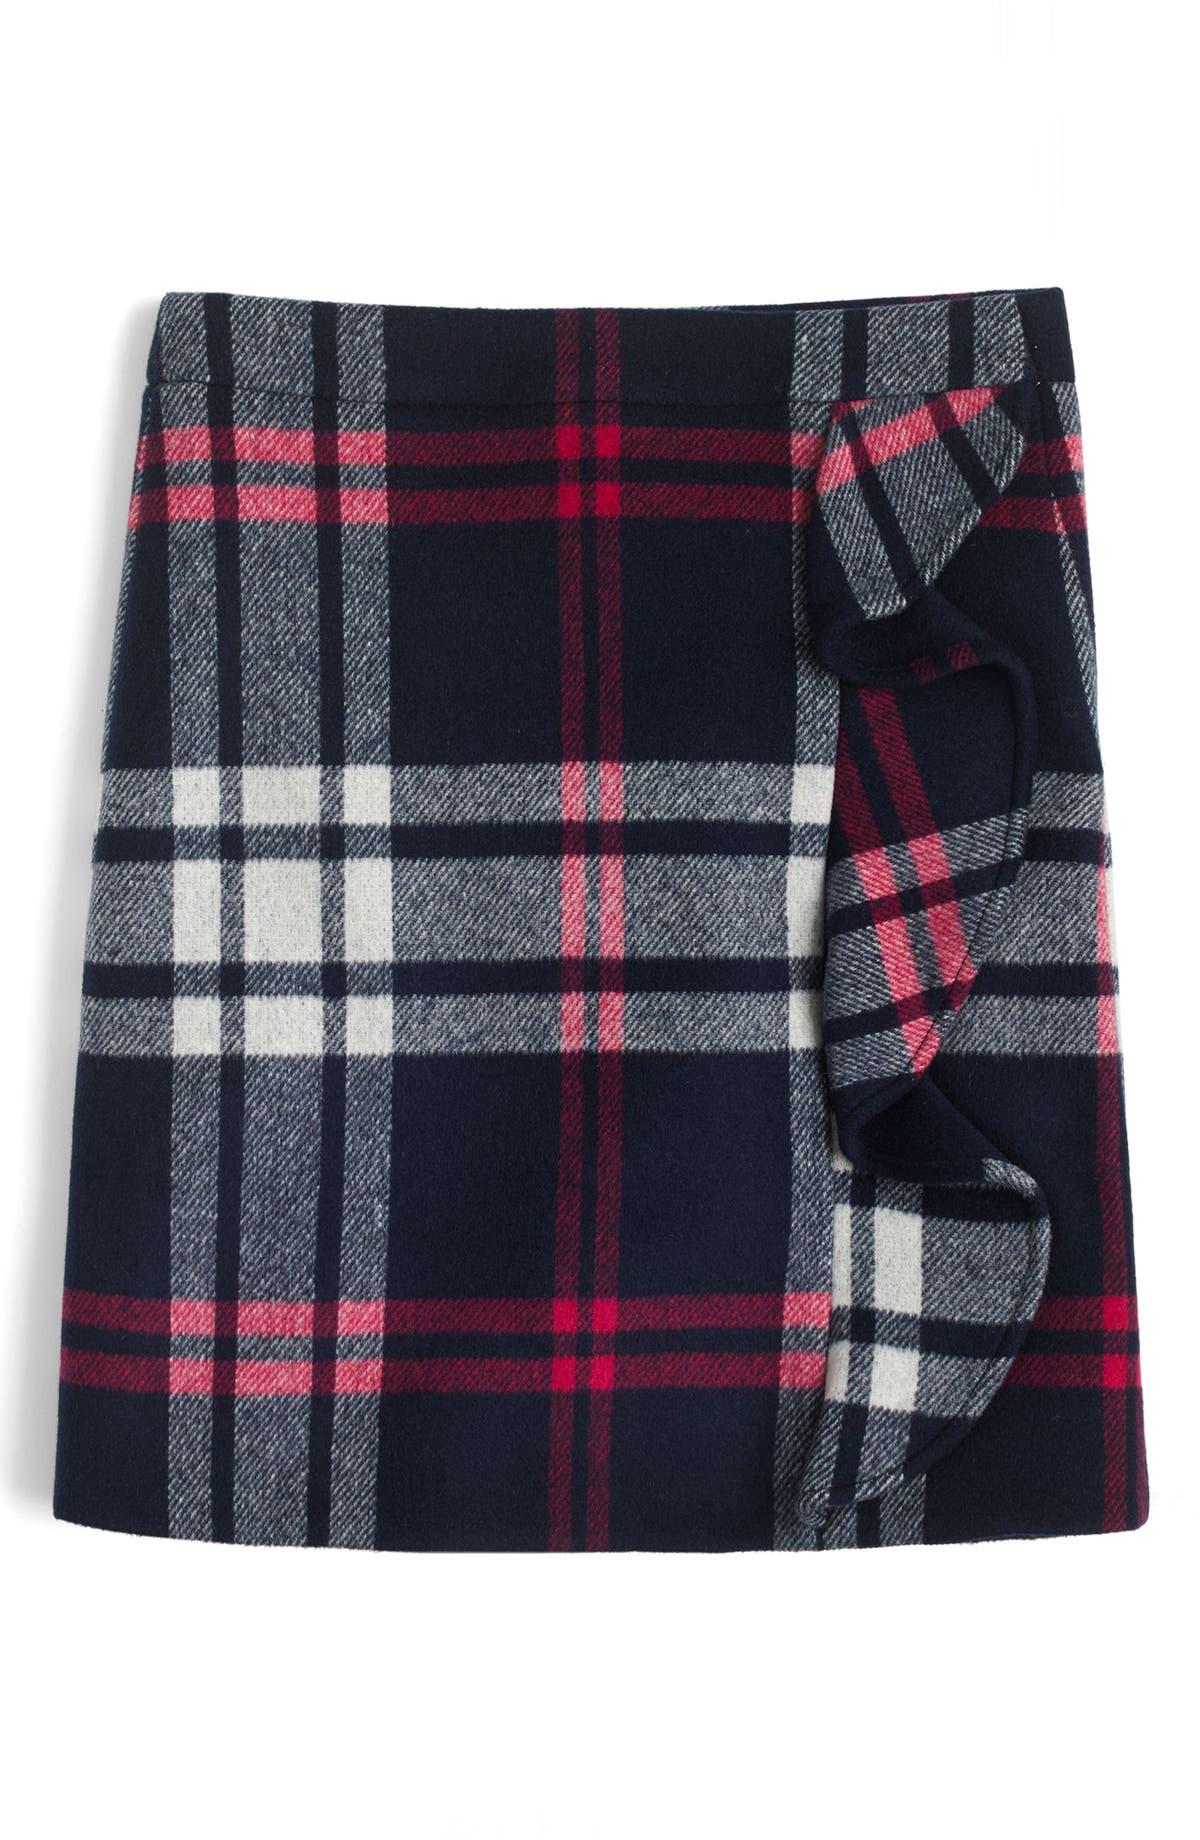 3c47b3ee4a J.Crew Plaid Ruffle Double-Serge Wool Mini Skirt (Regular & Petite) |  Nordstrom